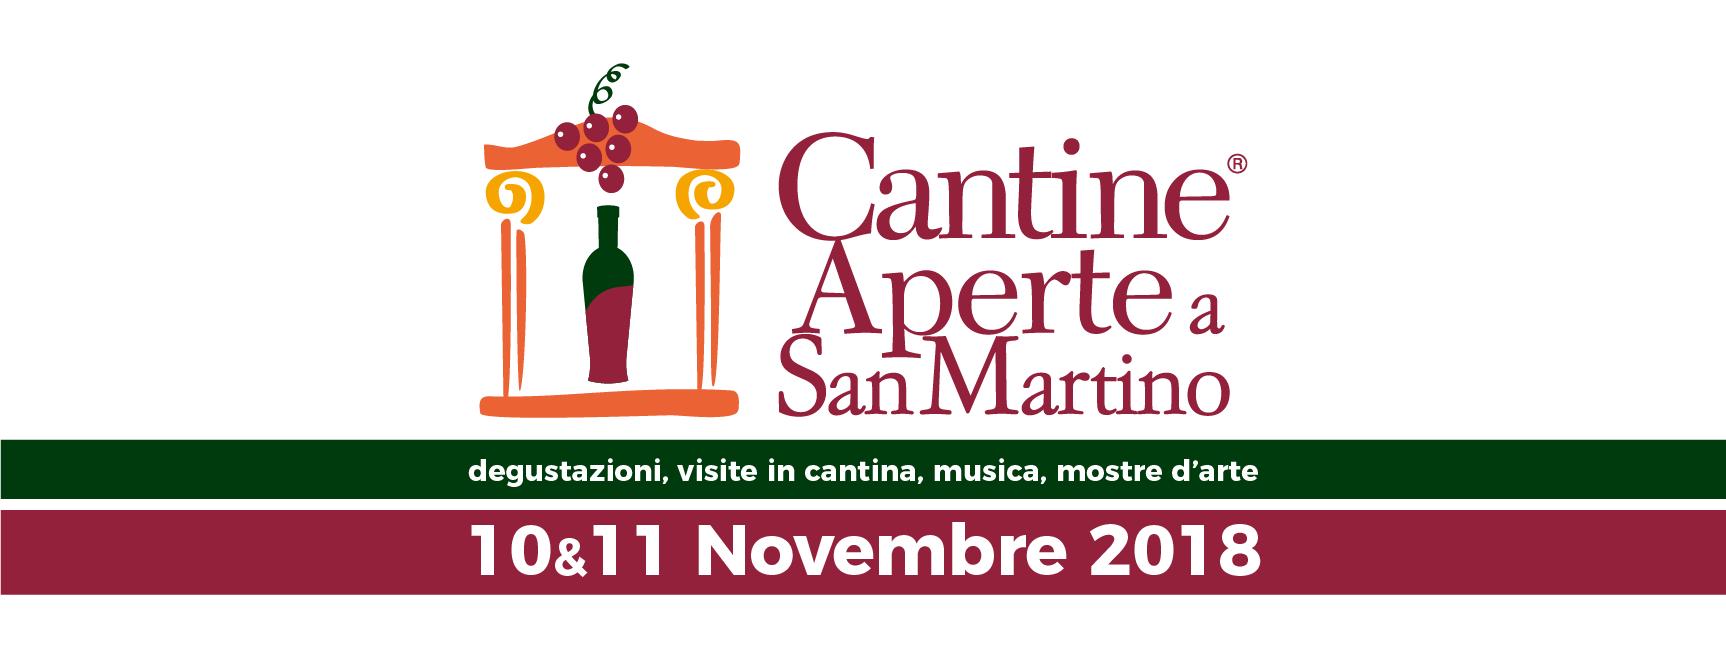 Cantine Aperte a San Martino 10 e 11 Novembre 2018